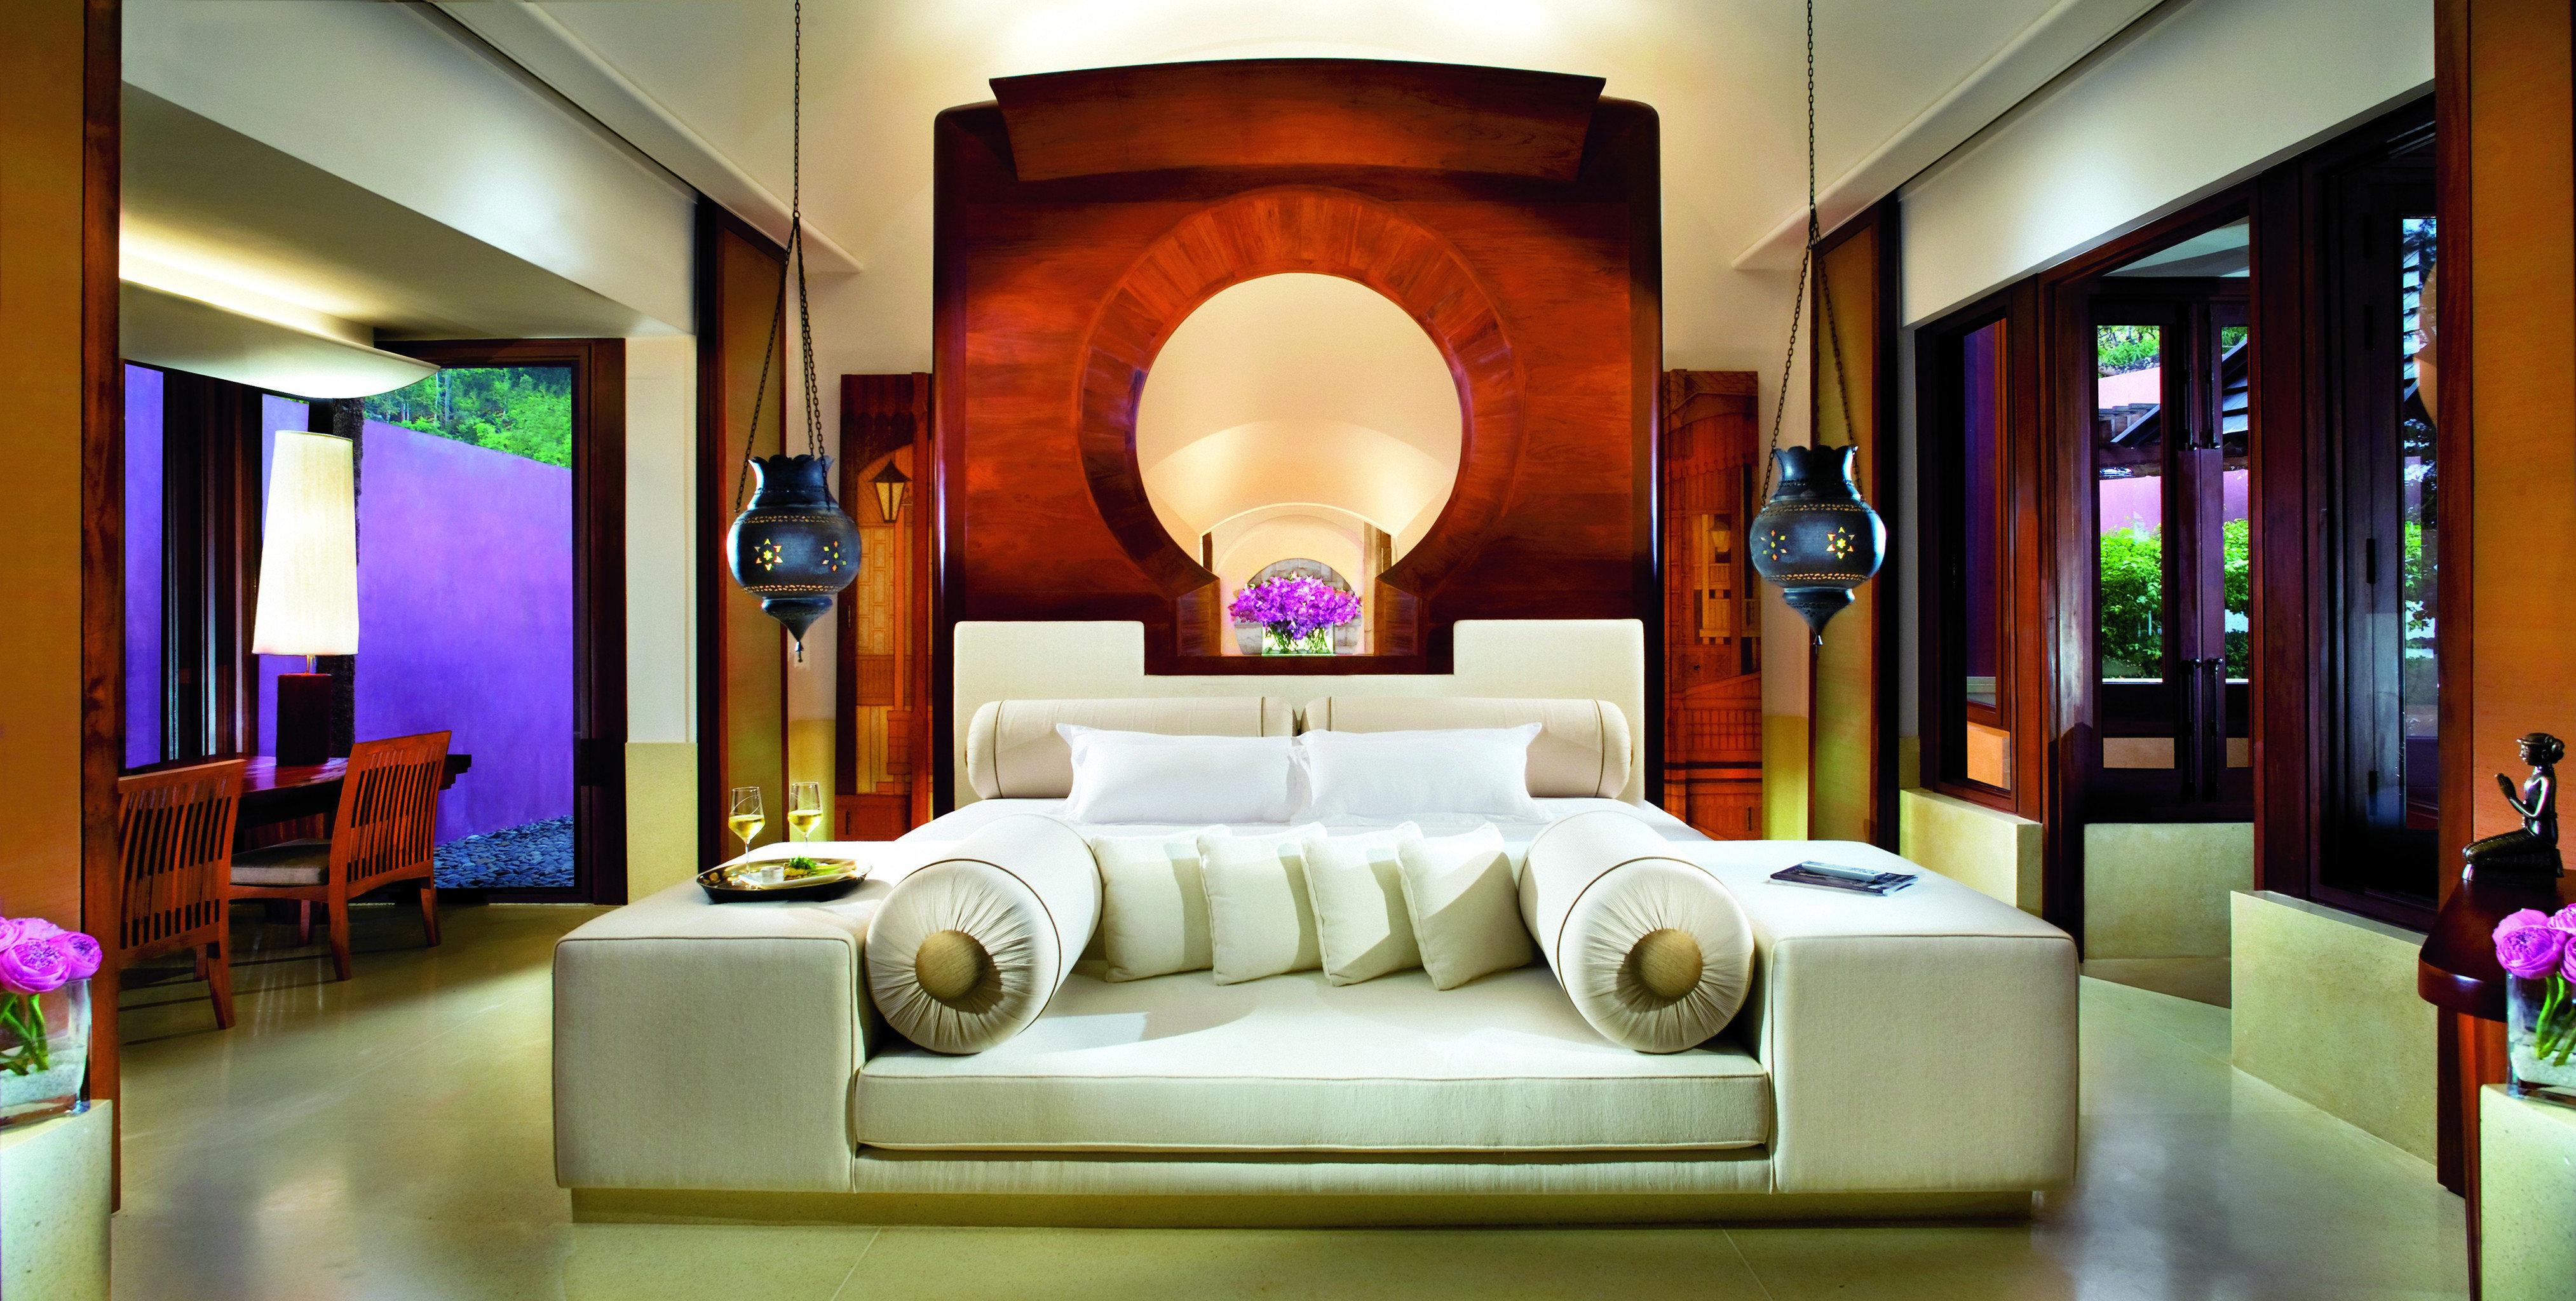 Beachfront Bedroom Cultural Elegant Honeymoon Jungle Luxury Nature Romance Romantic Tropical Lobby property living room Suite home mansion Resort Villa